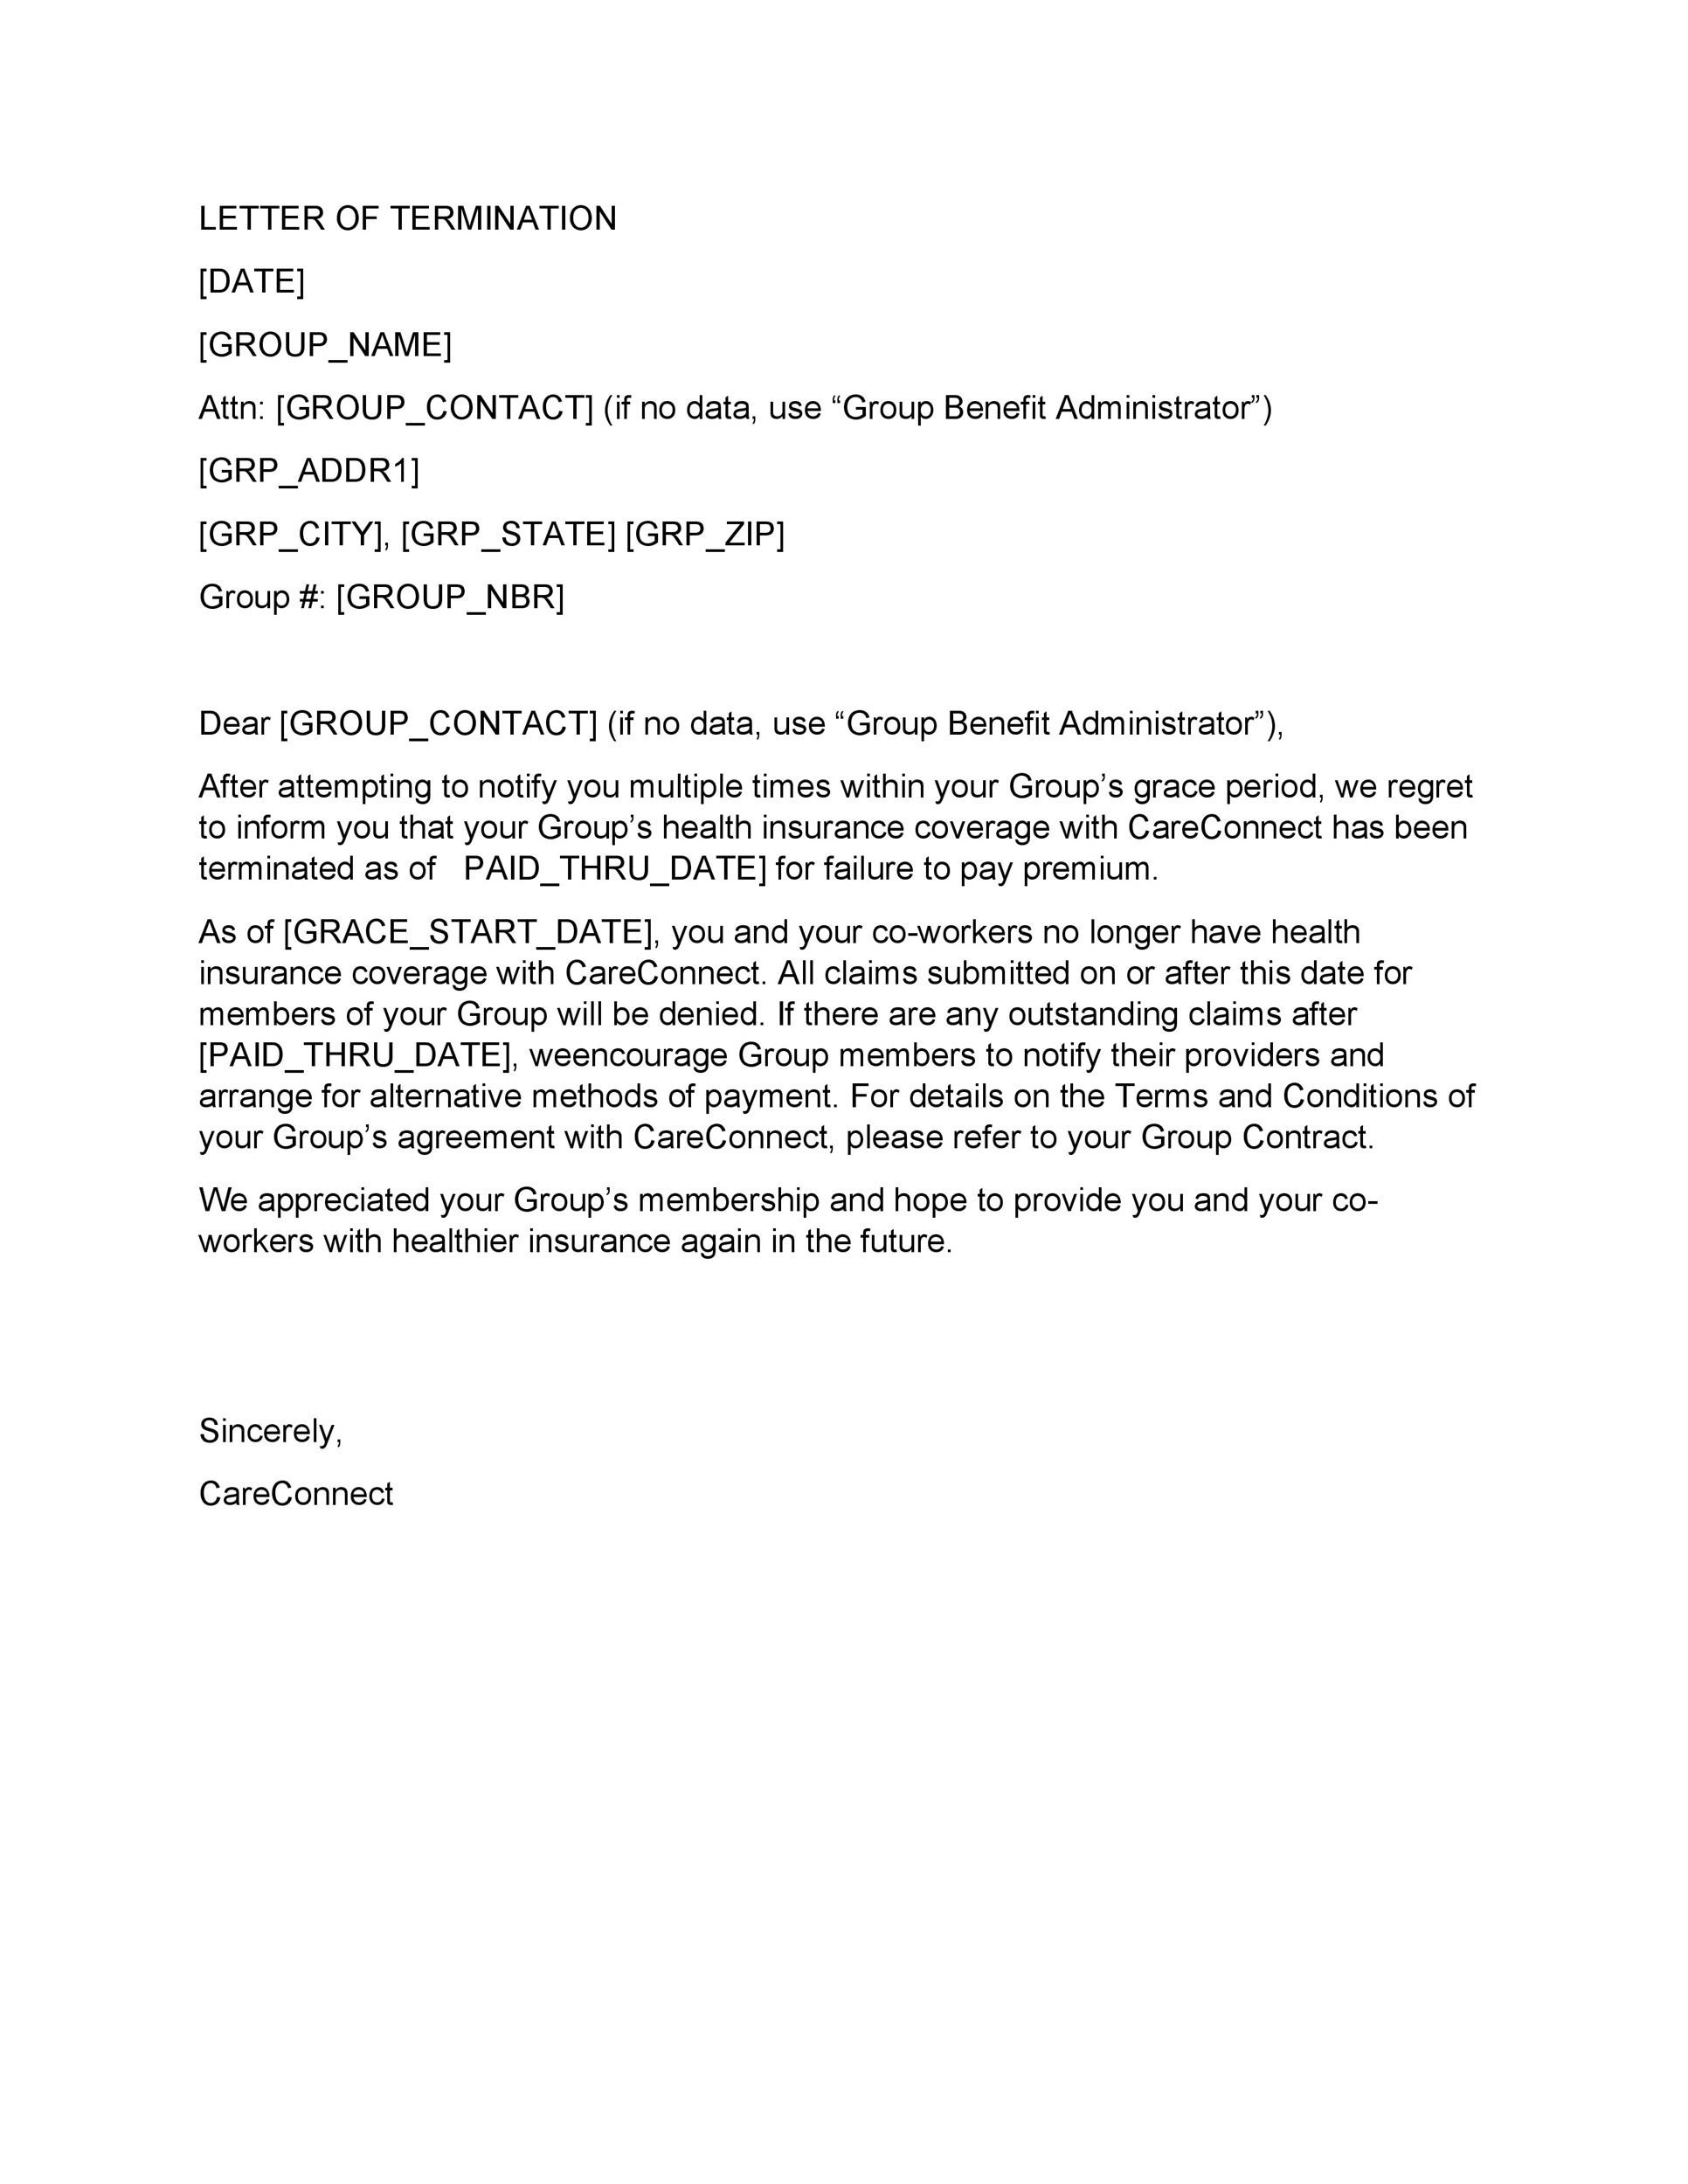 35 Perfect Termination Letter Samples Lease, Employee, Contract - termination letter description